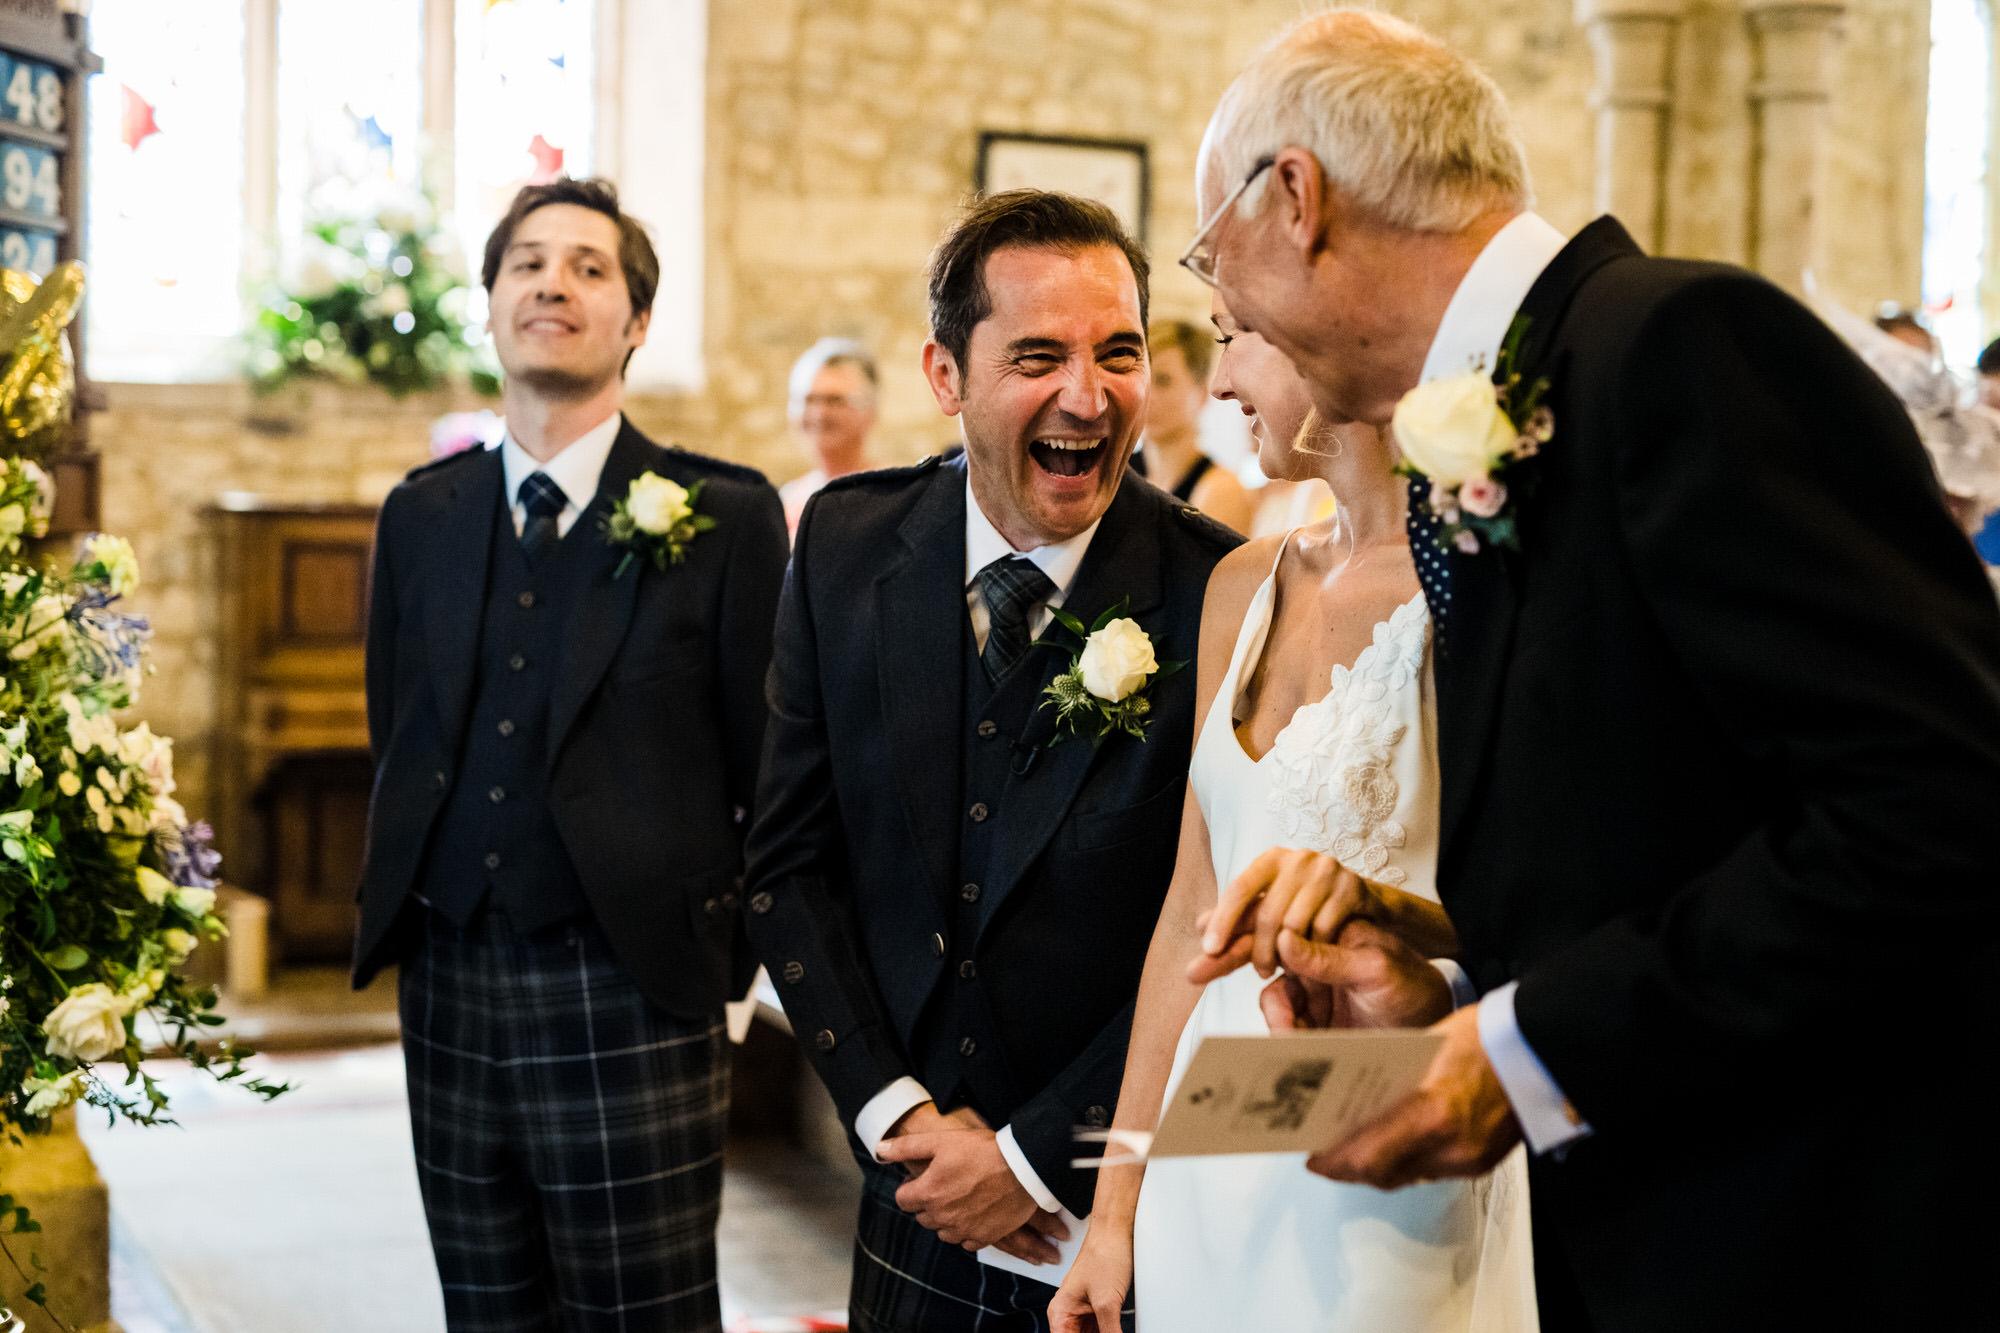 Dorset marquee wedding by the sea simon biffen photography 15